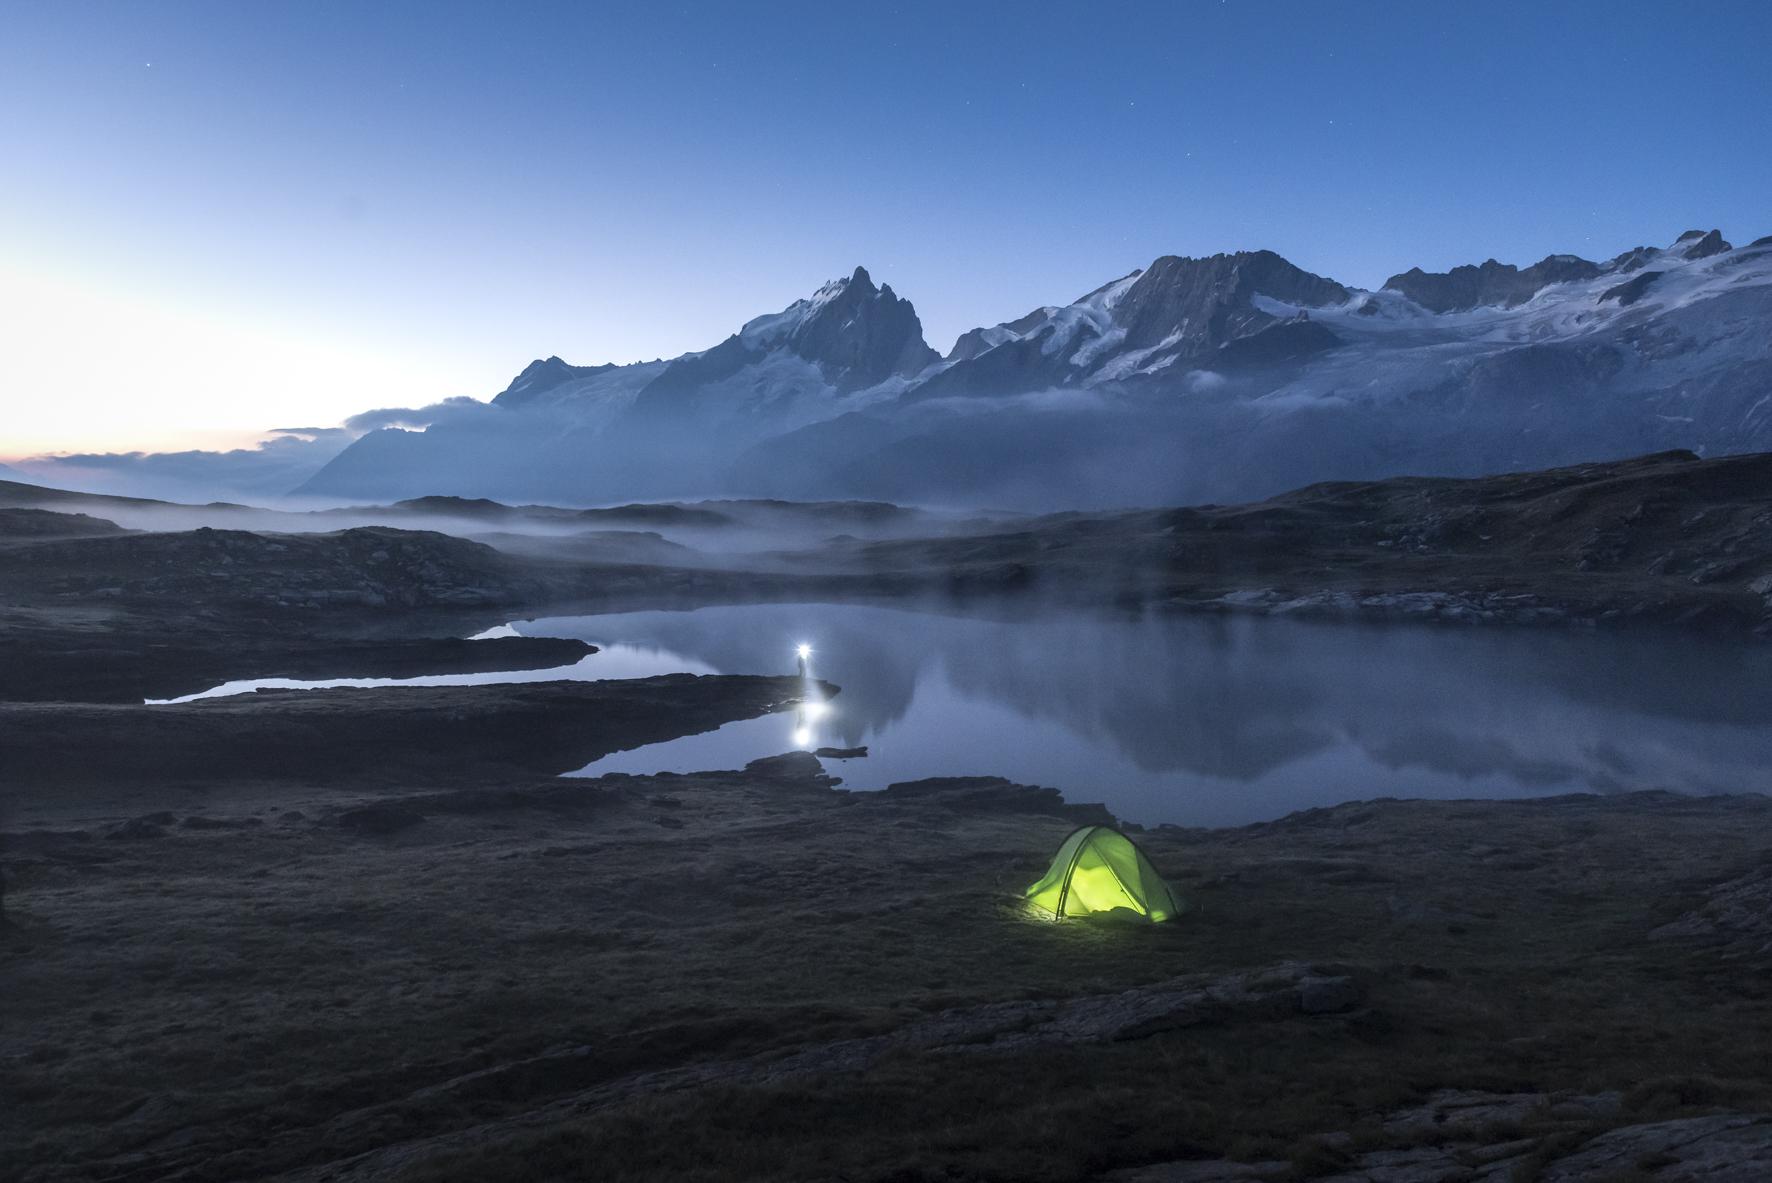 Randonneurs-Plateau-Emparis-©-Carlos-Ayesta-555